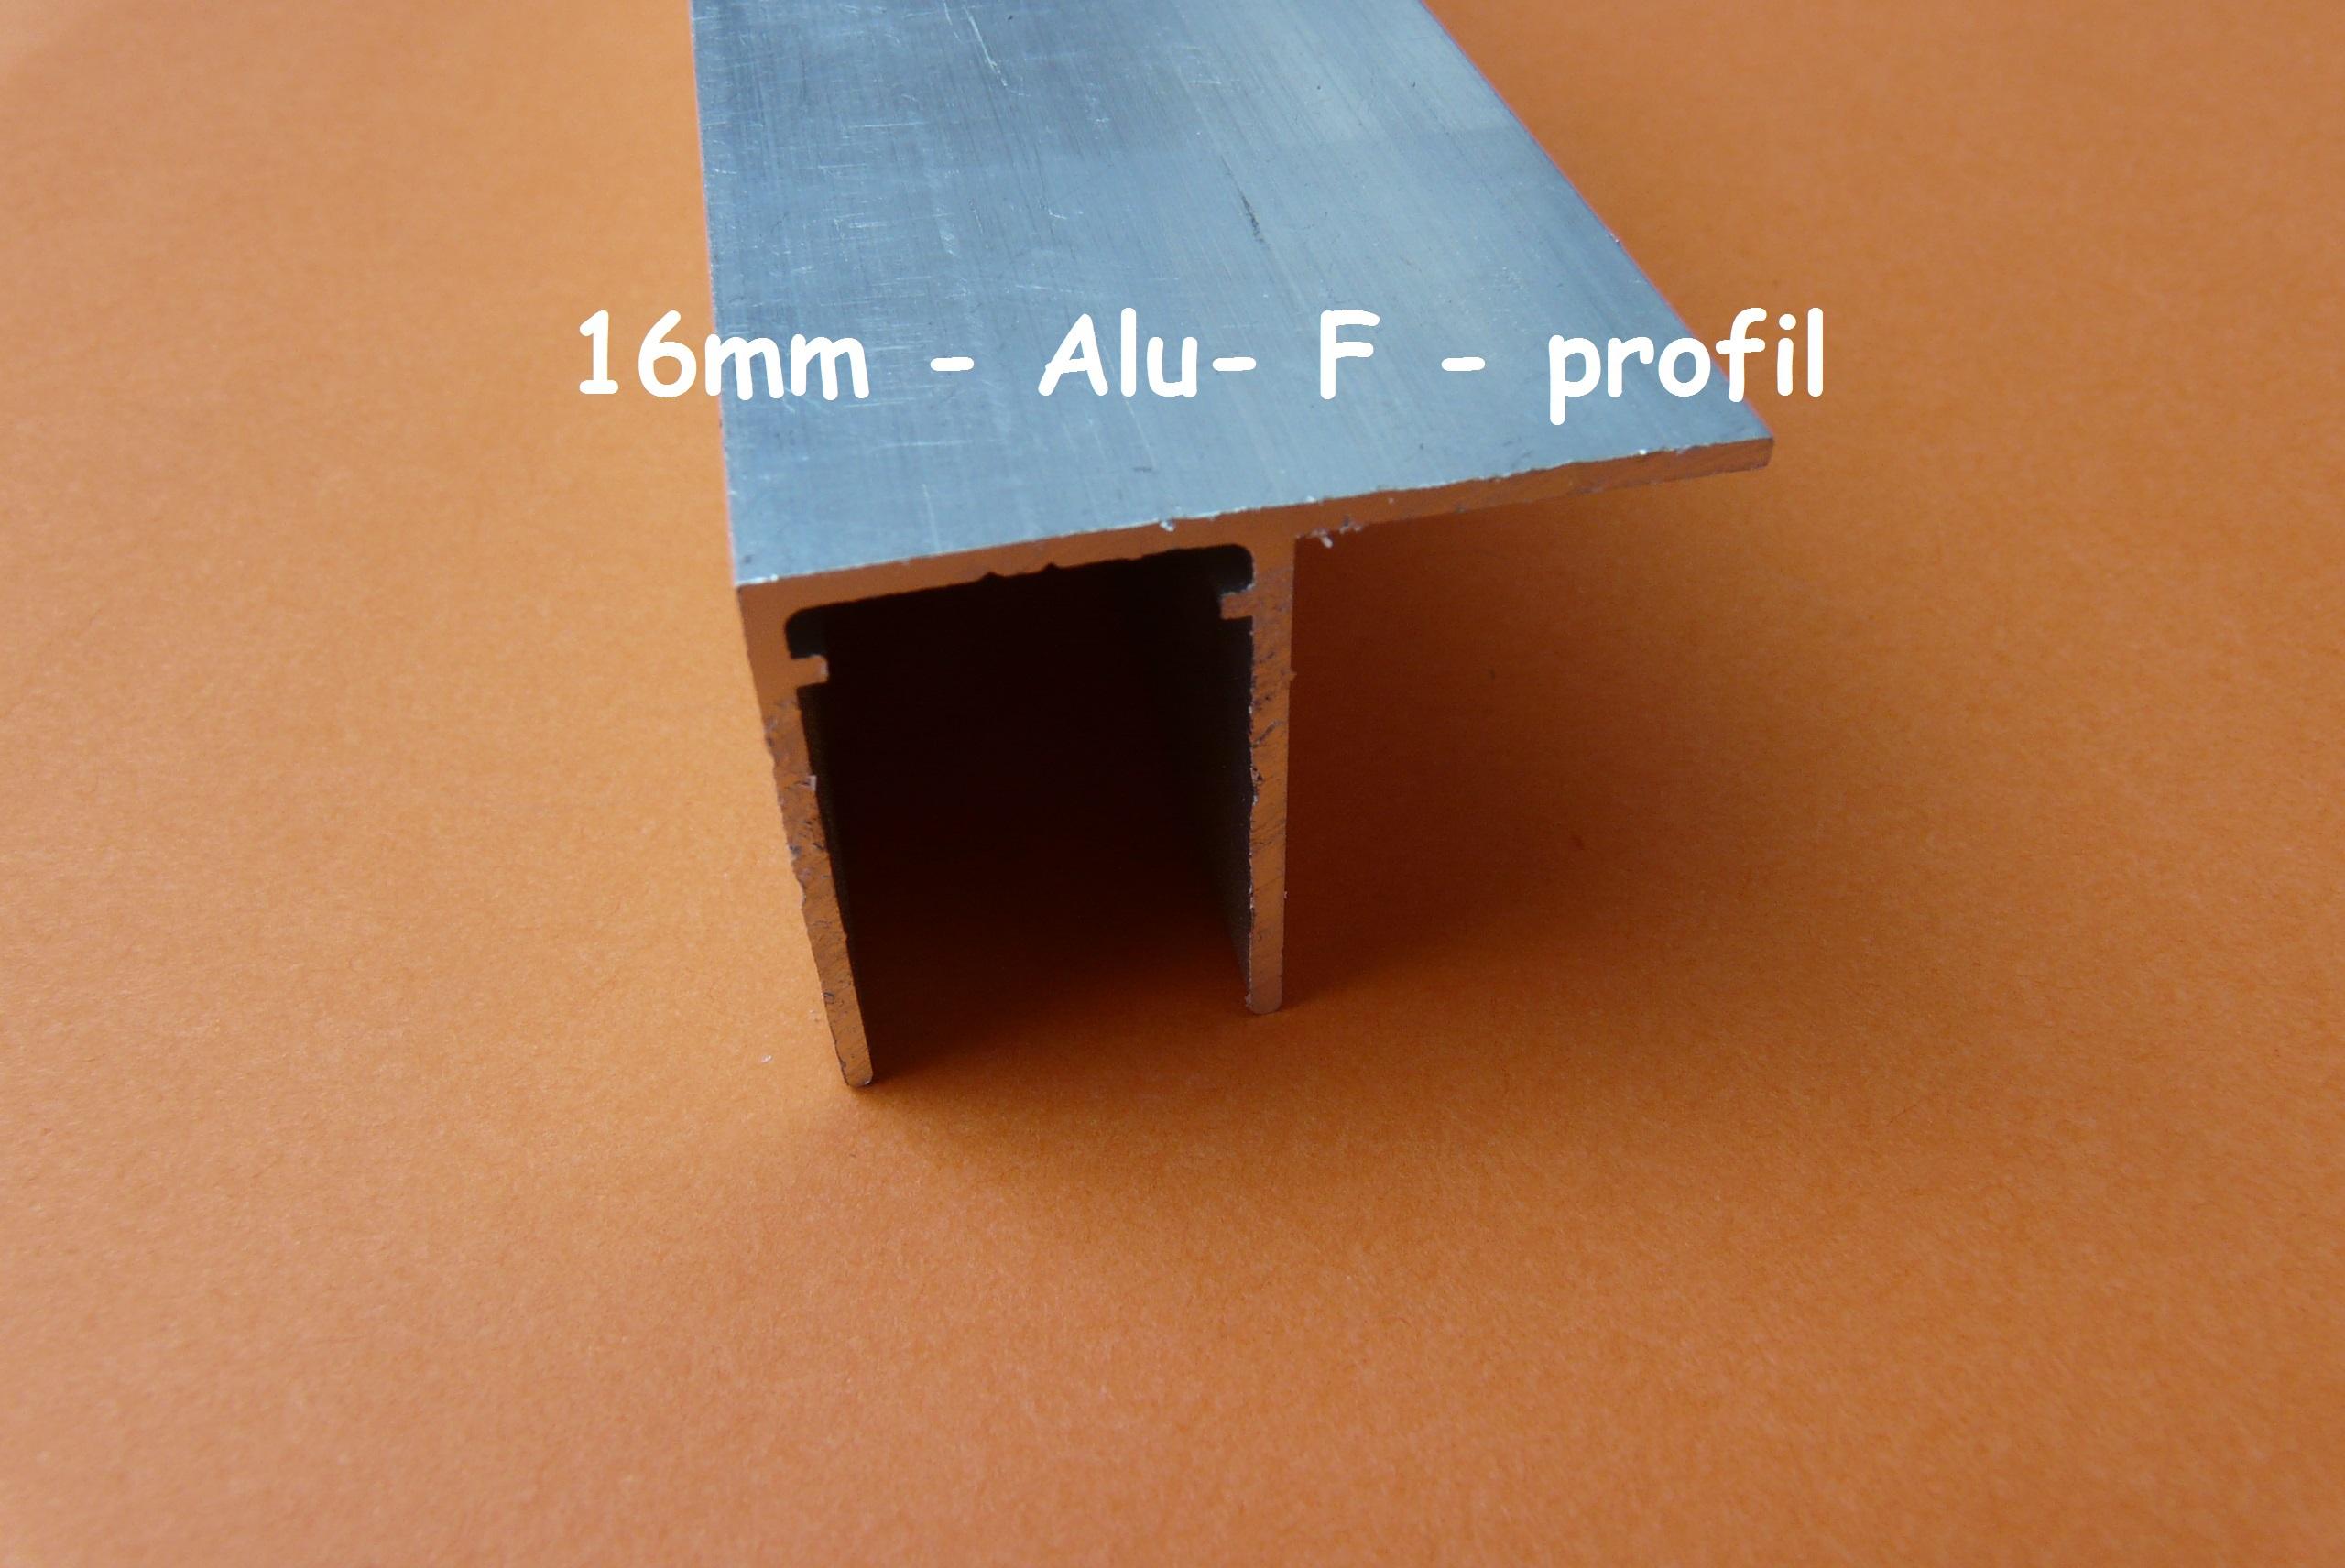 alu eck profil stegplatte gew chshaus verlegeprofile zubeh r 16mm ebay. Black Bedroom Furniture Sets. Home Design Ideas